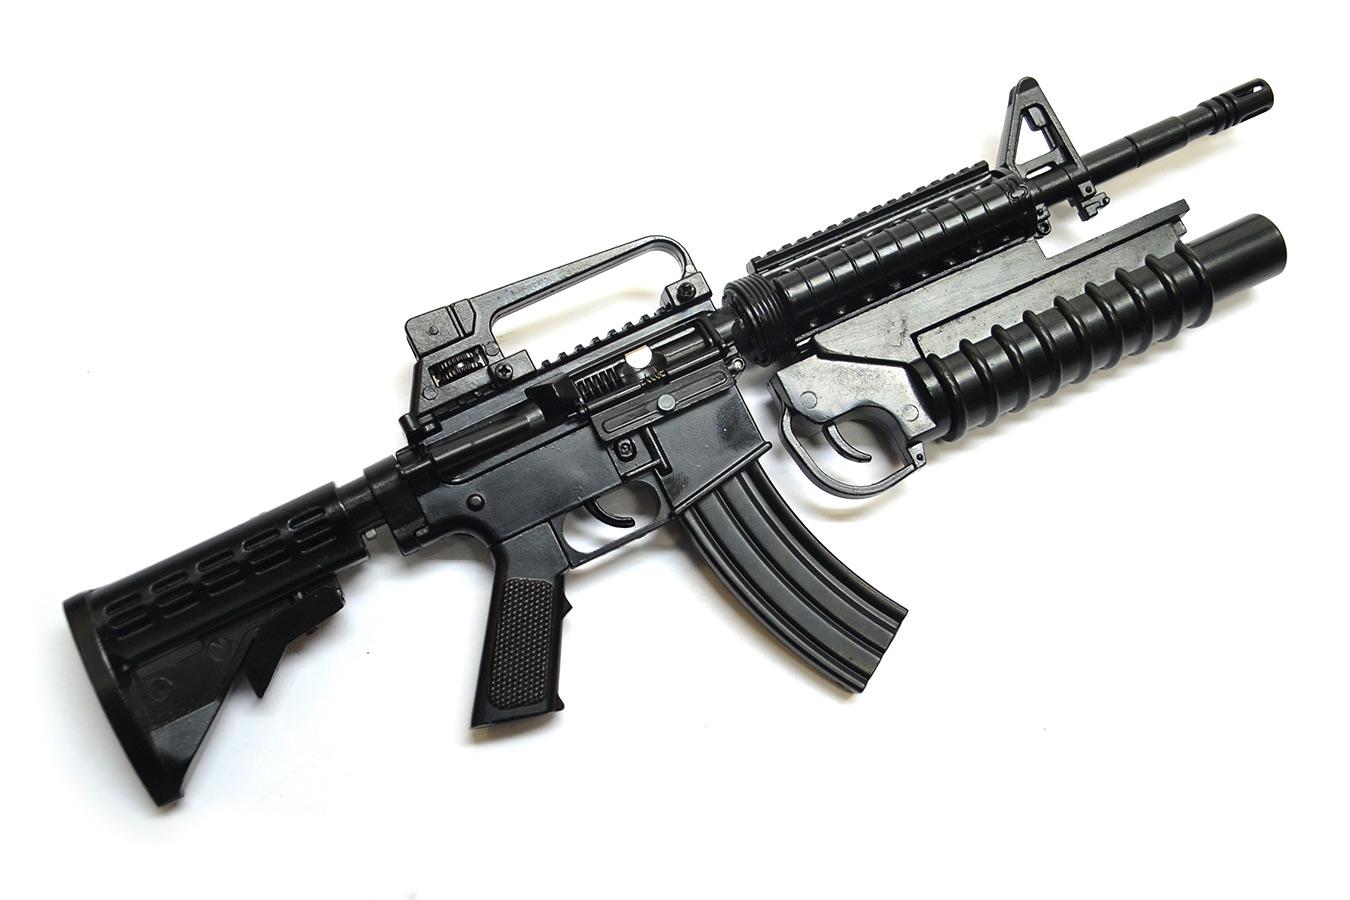 Colt M4A1 изображение 1